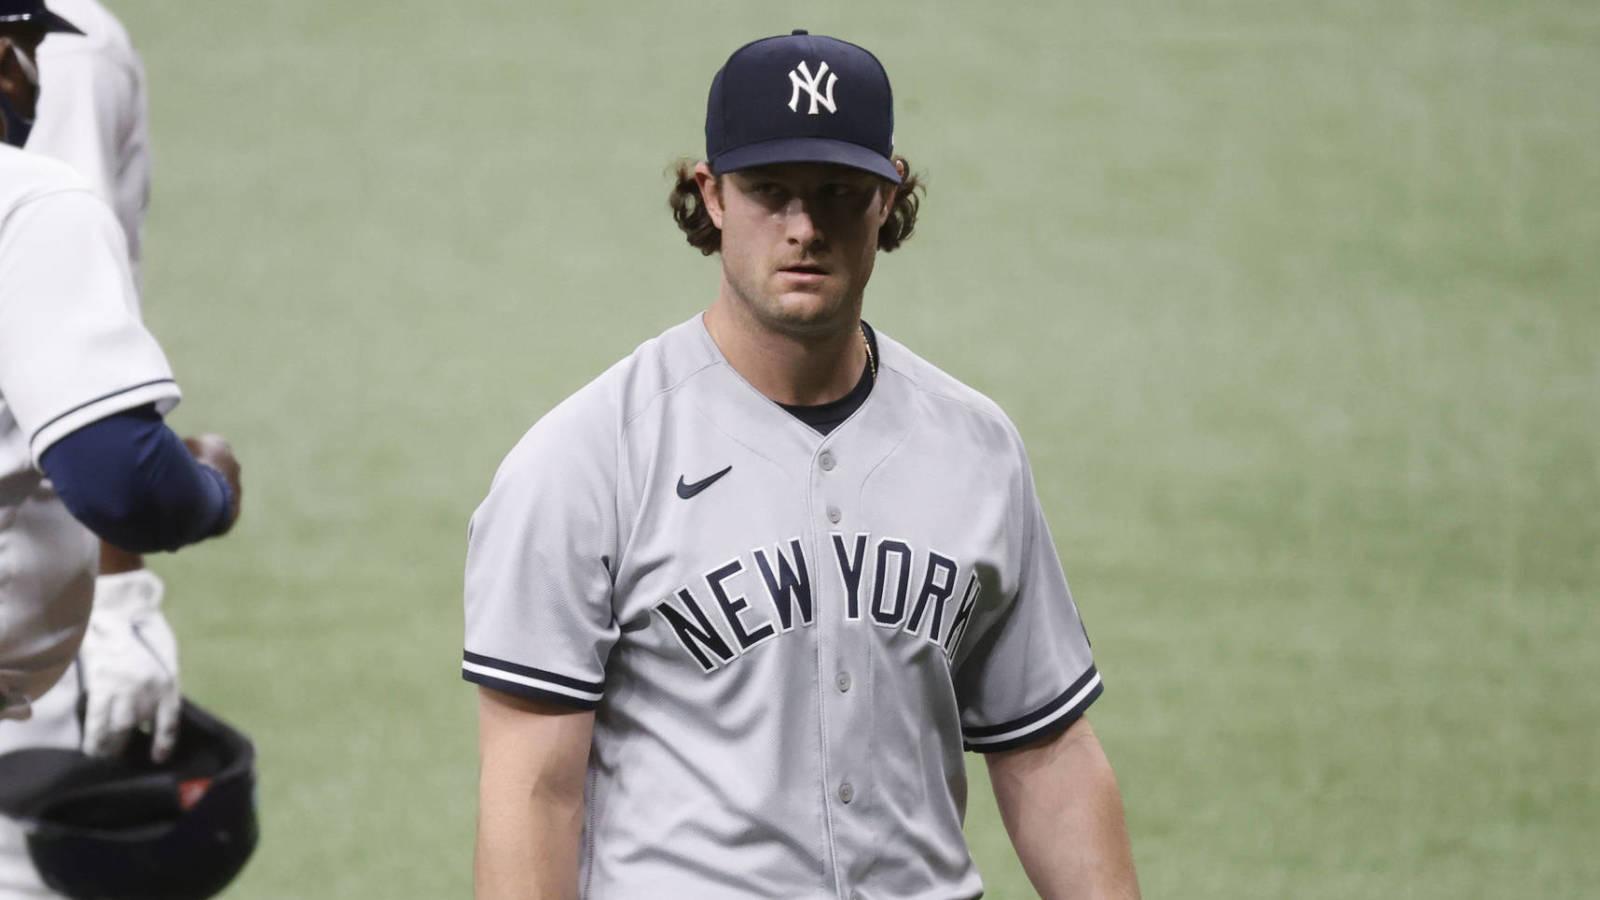 Yankees ace Gerrit Cole doesn't deny handling baseballs